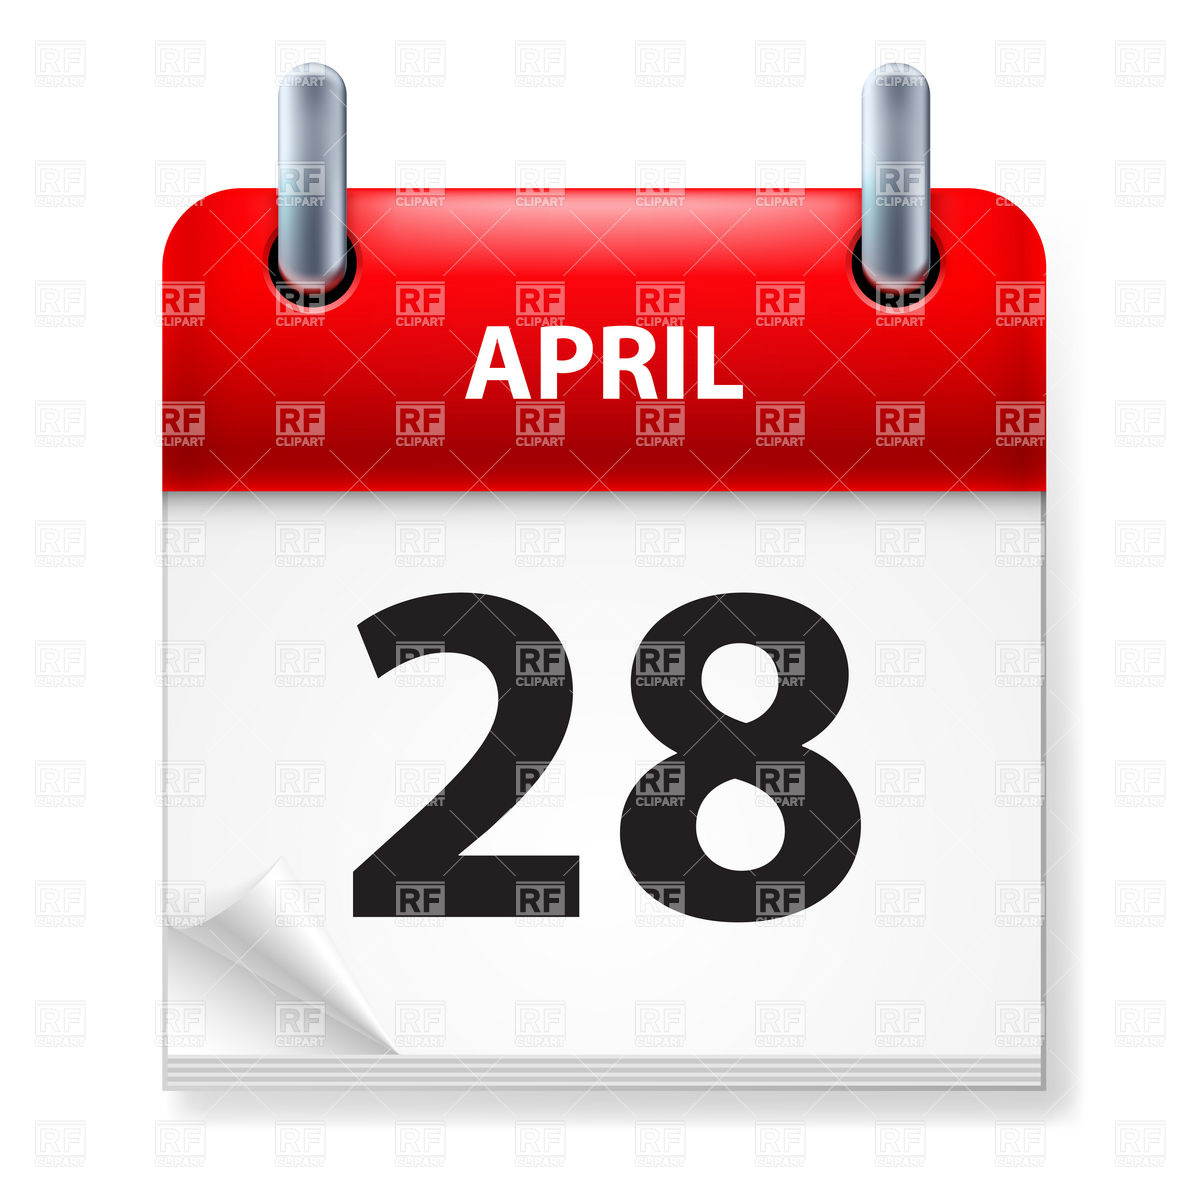 April 28th calendar clipart clipart freeuse stock April 28th calendar clipart - ClipartFest clipart freeuse stock